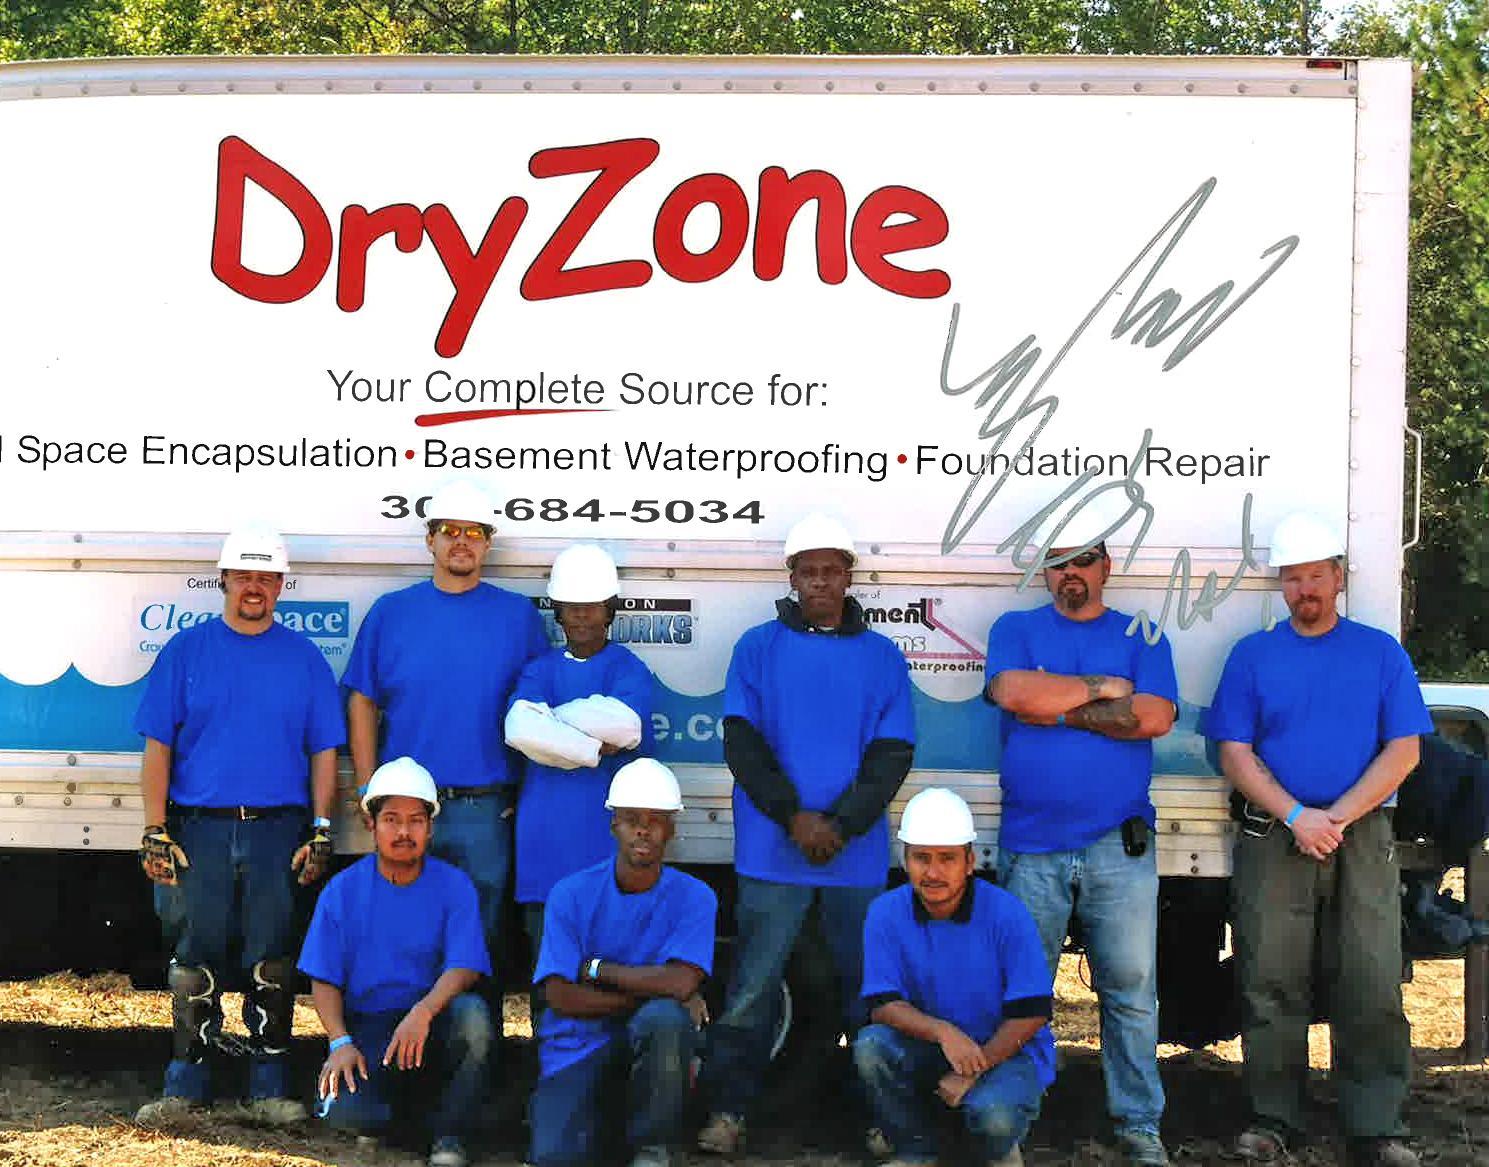 DryZone Team Photo Autographed By Ty Pennington